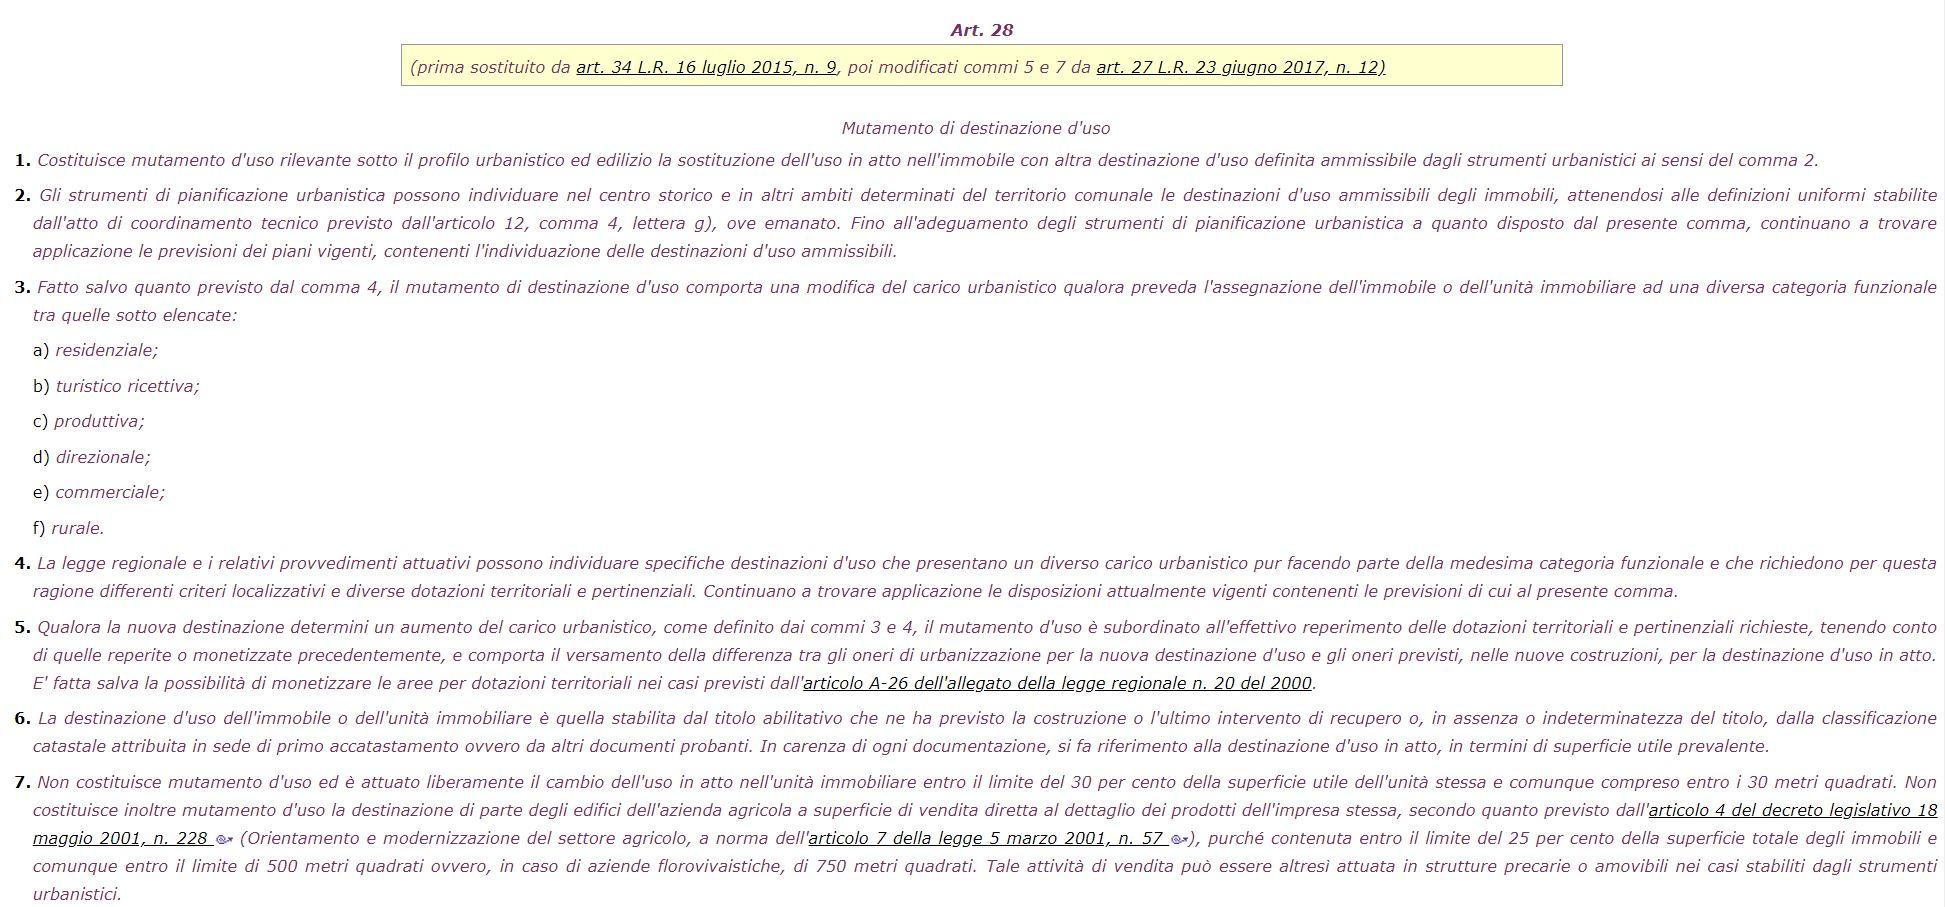 art 28 LR_15_2013